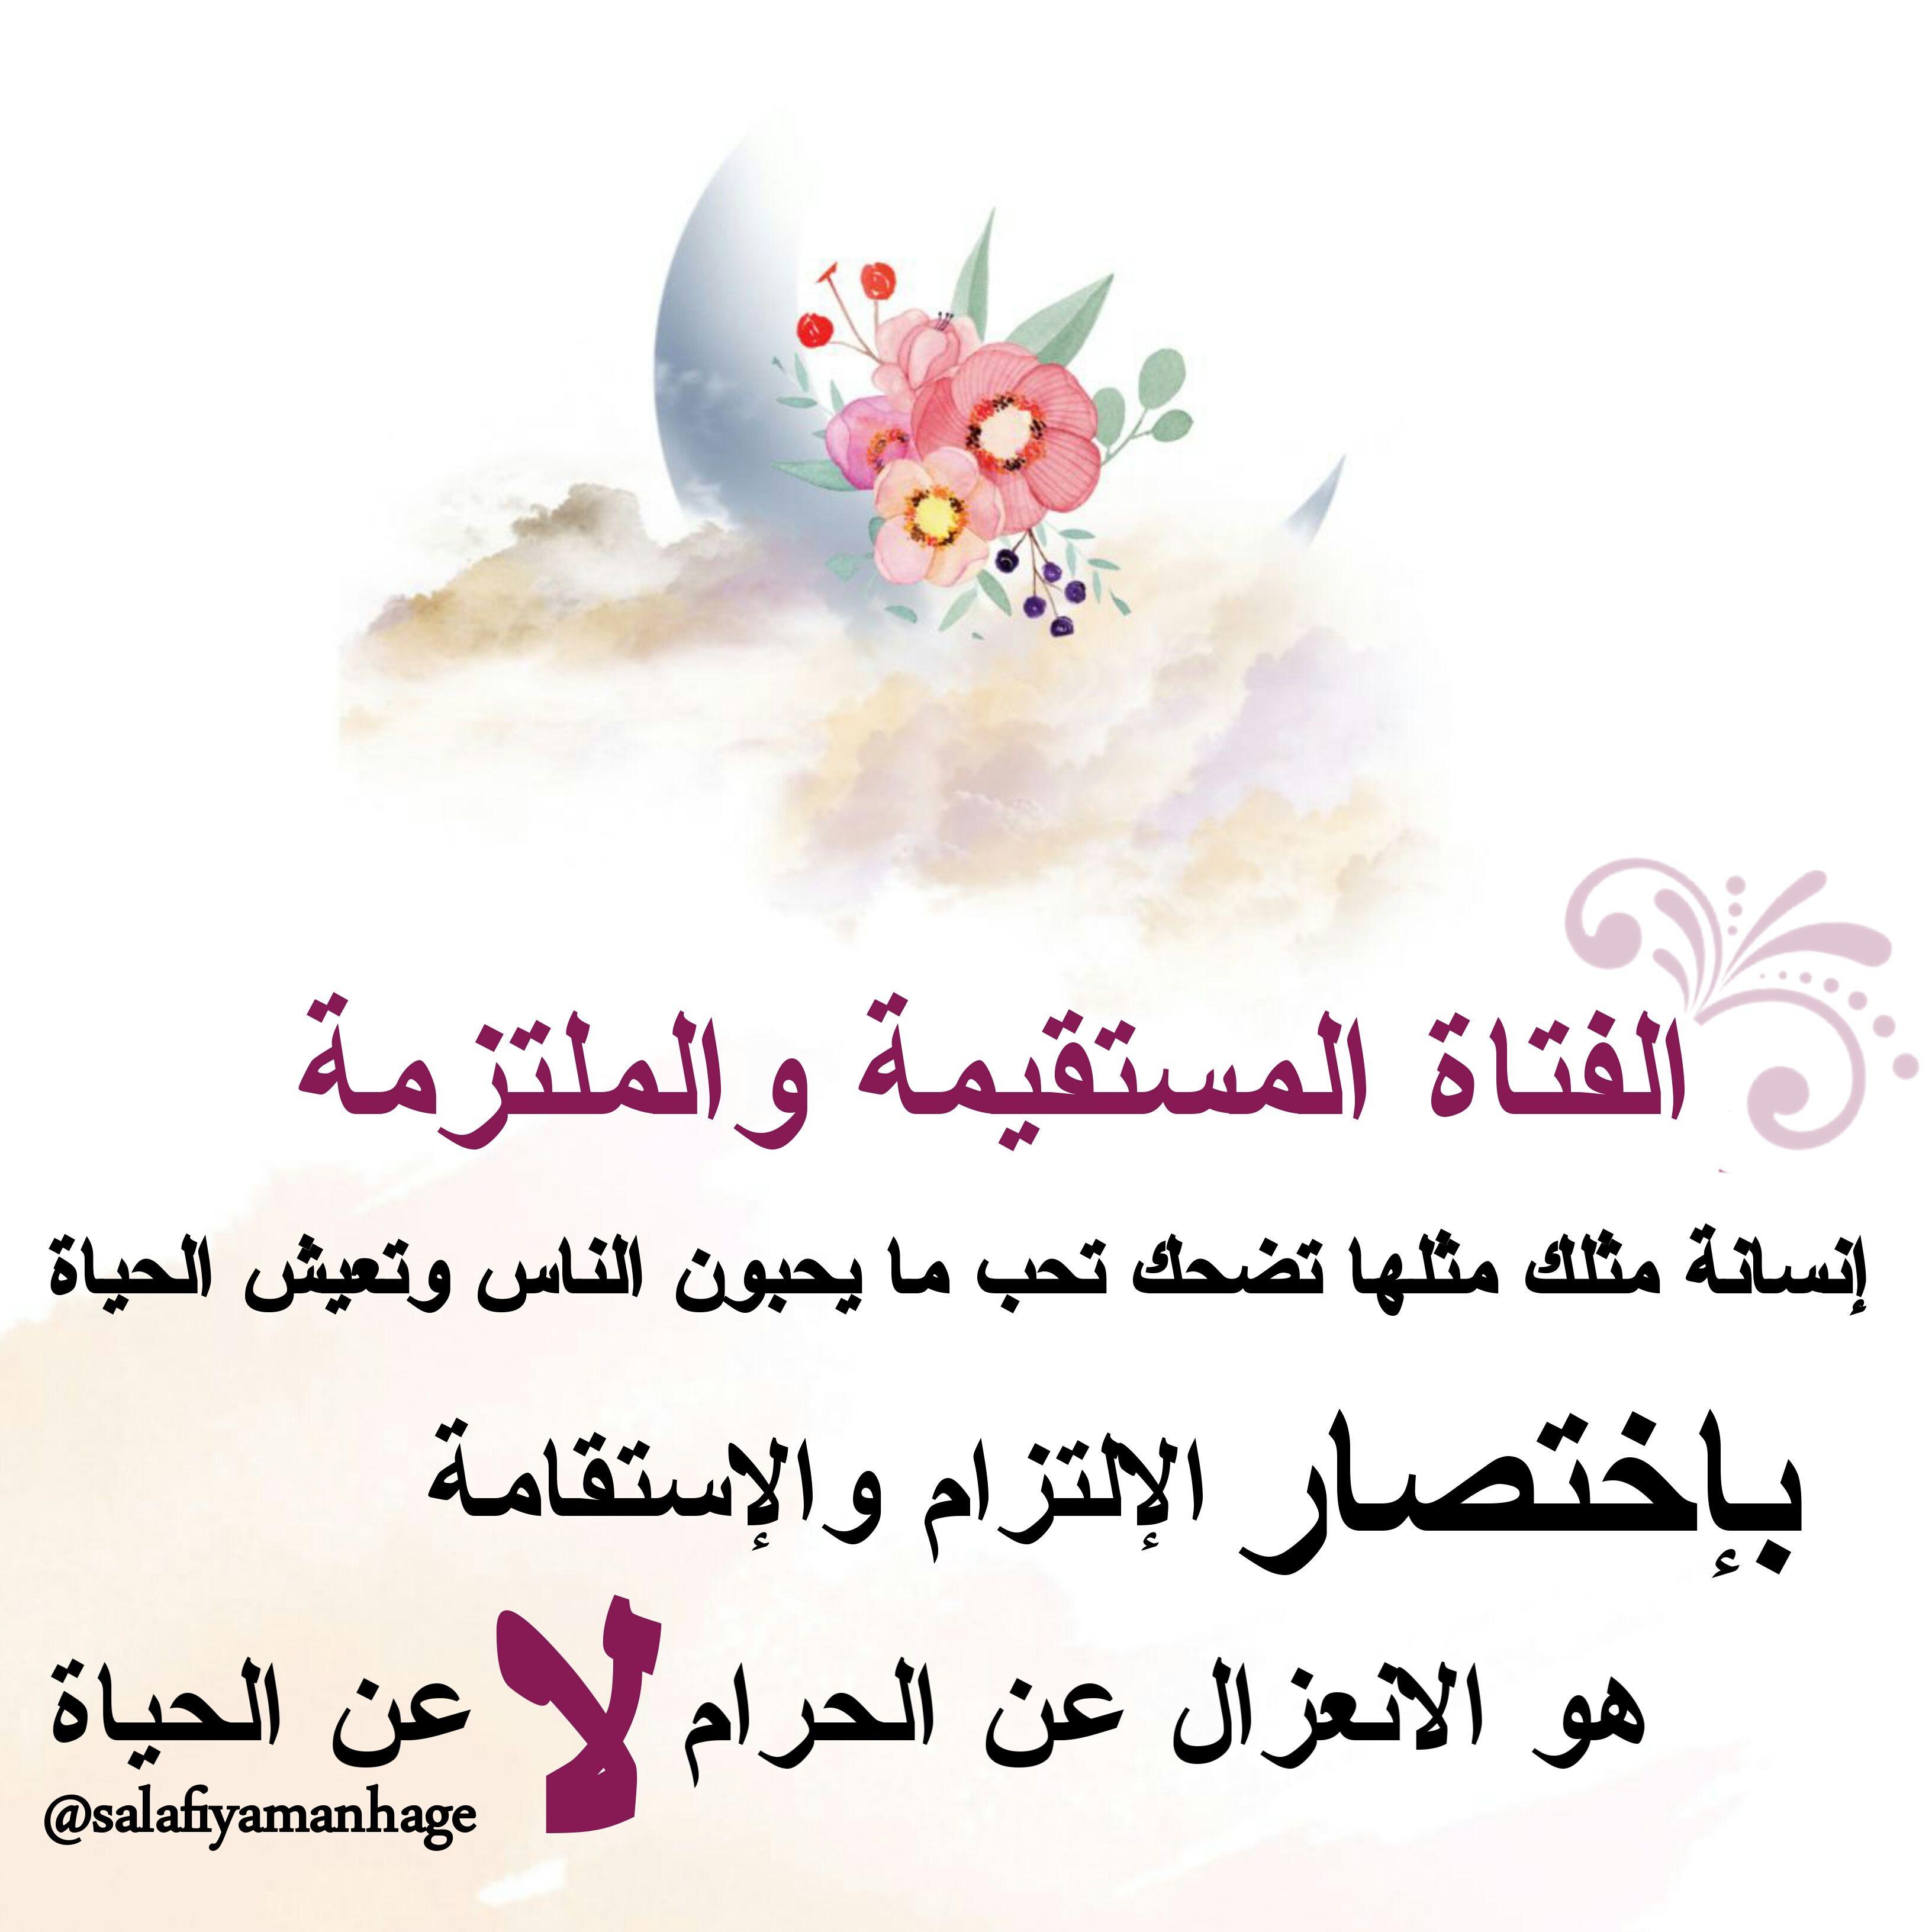 Pin By المرأة المسلمة On مواعظ ونصائح للأخوات Necklace Jewelry Lei Necklace